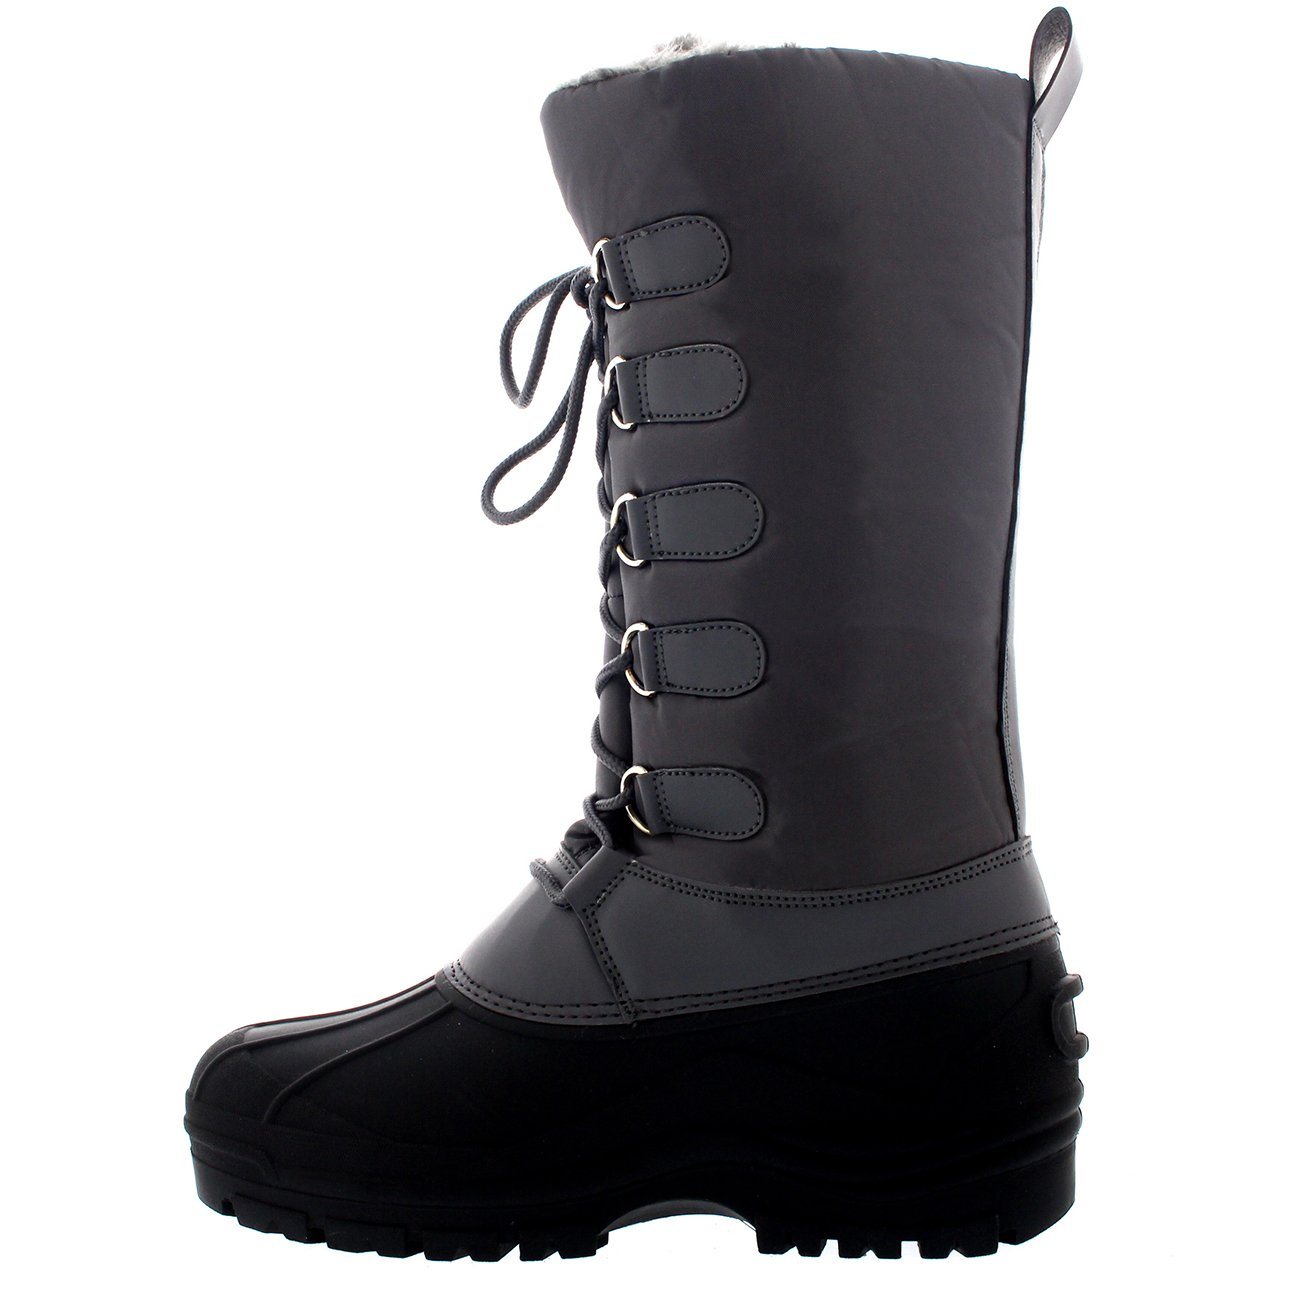 Womens Muck Lace Up Rain Nylon Durable Winter Snow Duck Mid Calf Boots B01GMU3BIO 8 B(M) US|Gray